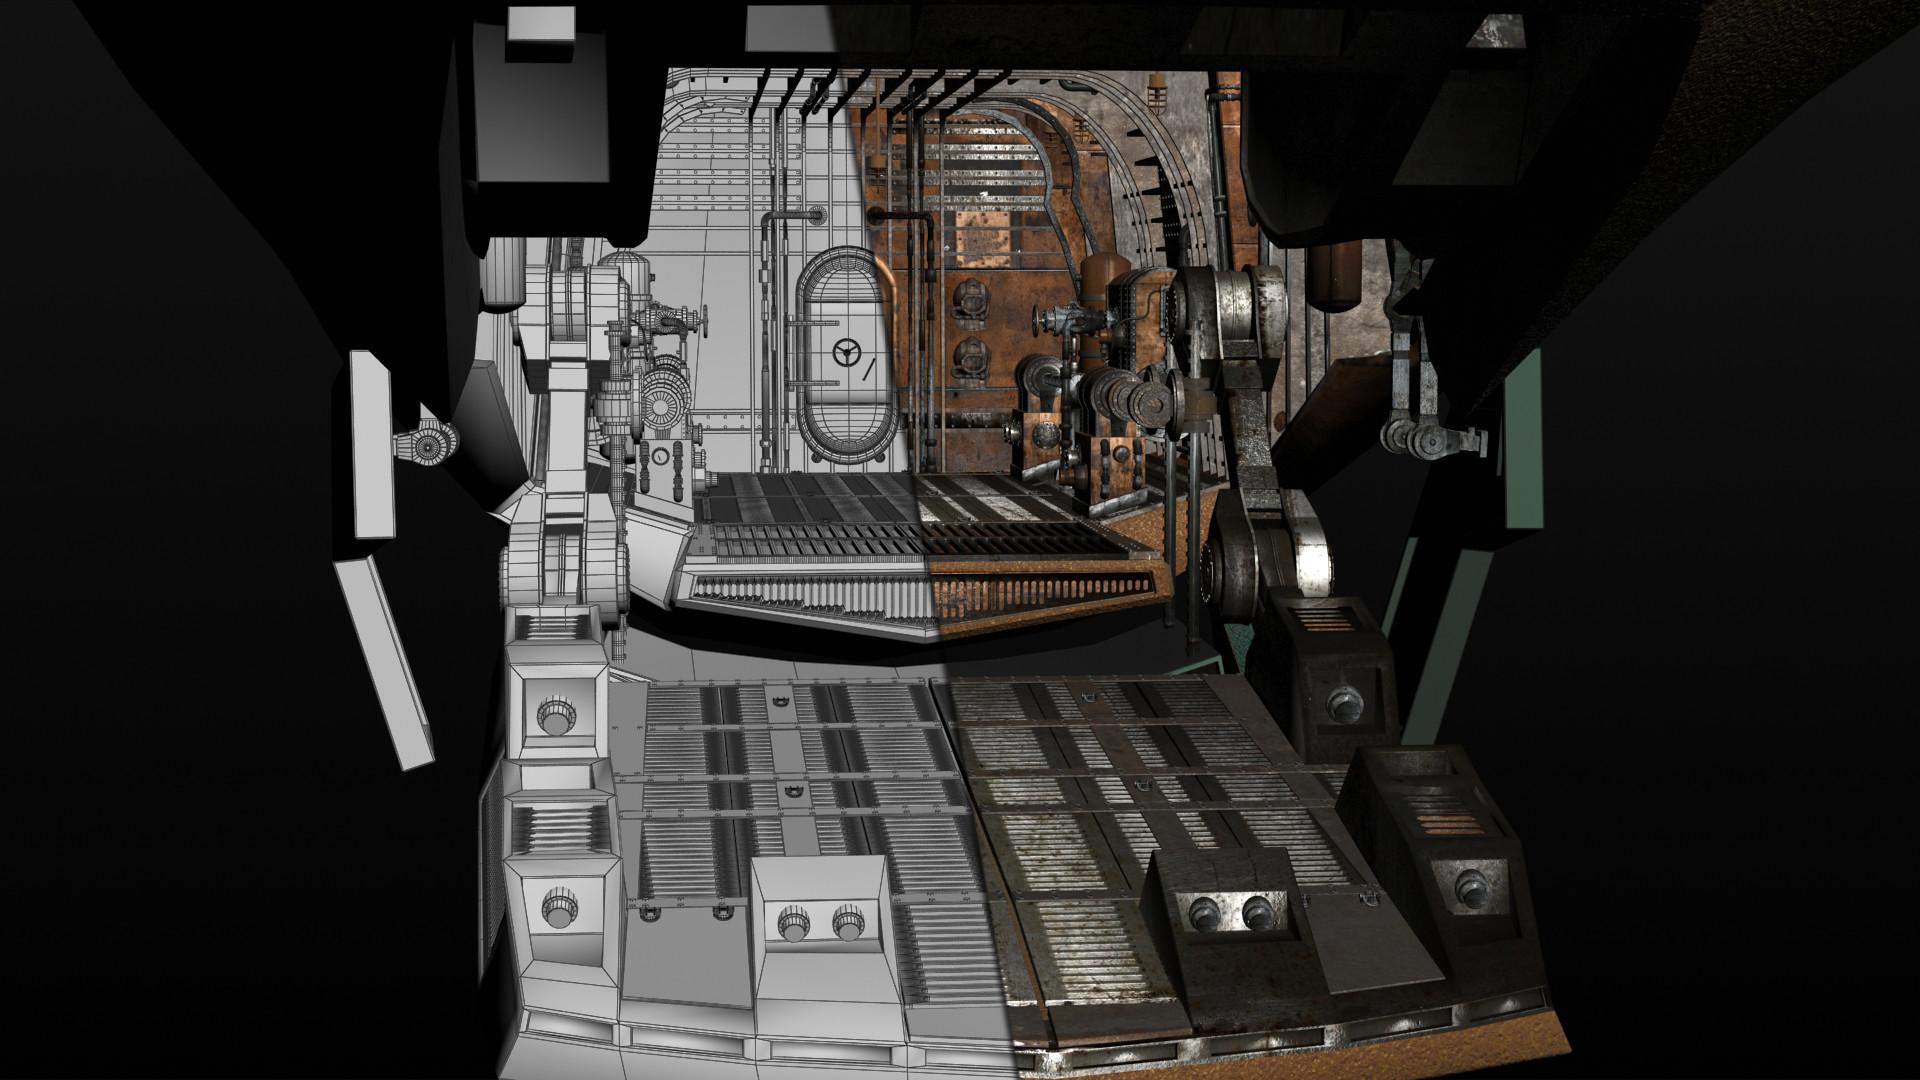 Design and modeling/surfacing of Nautilus cargo bay.